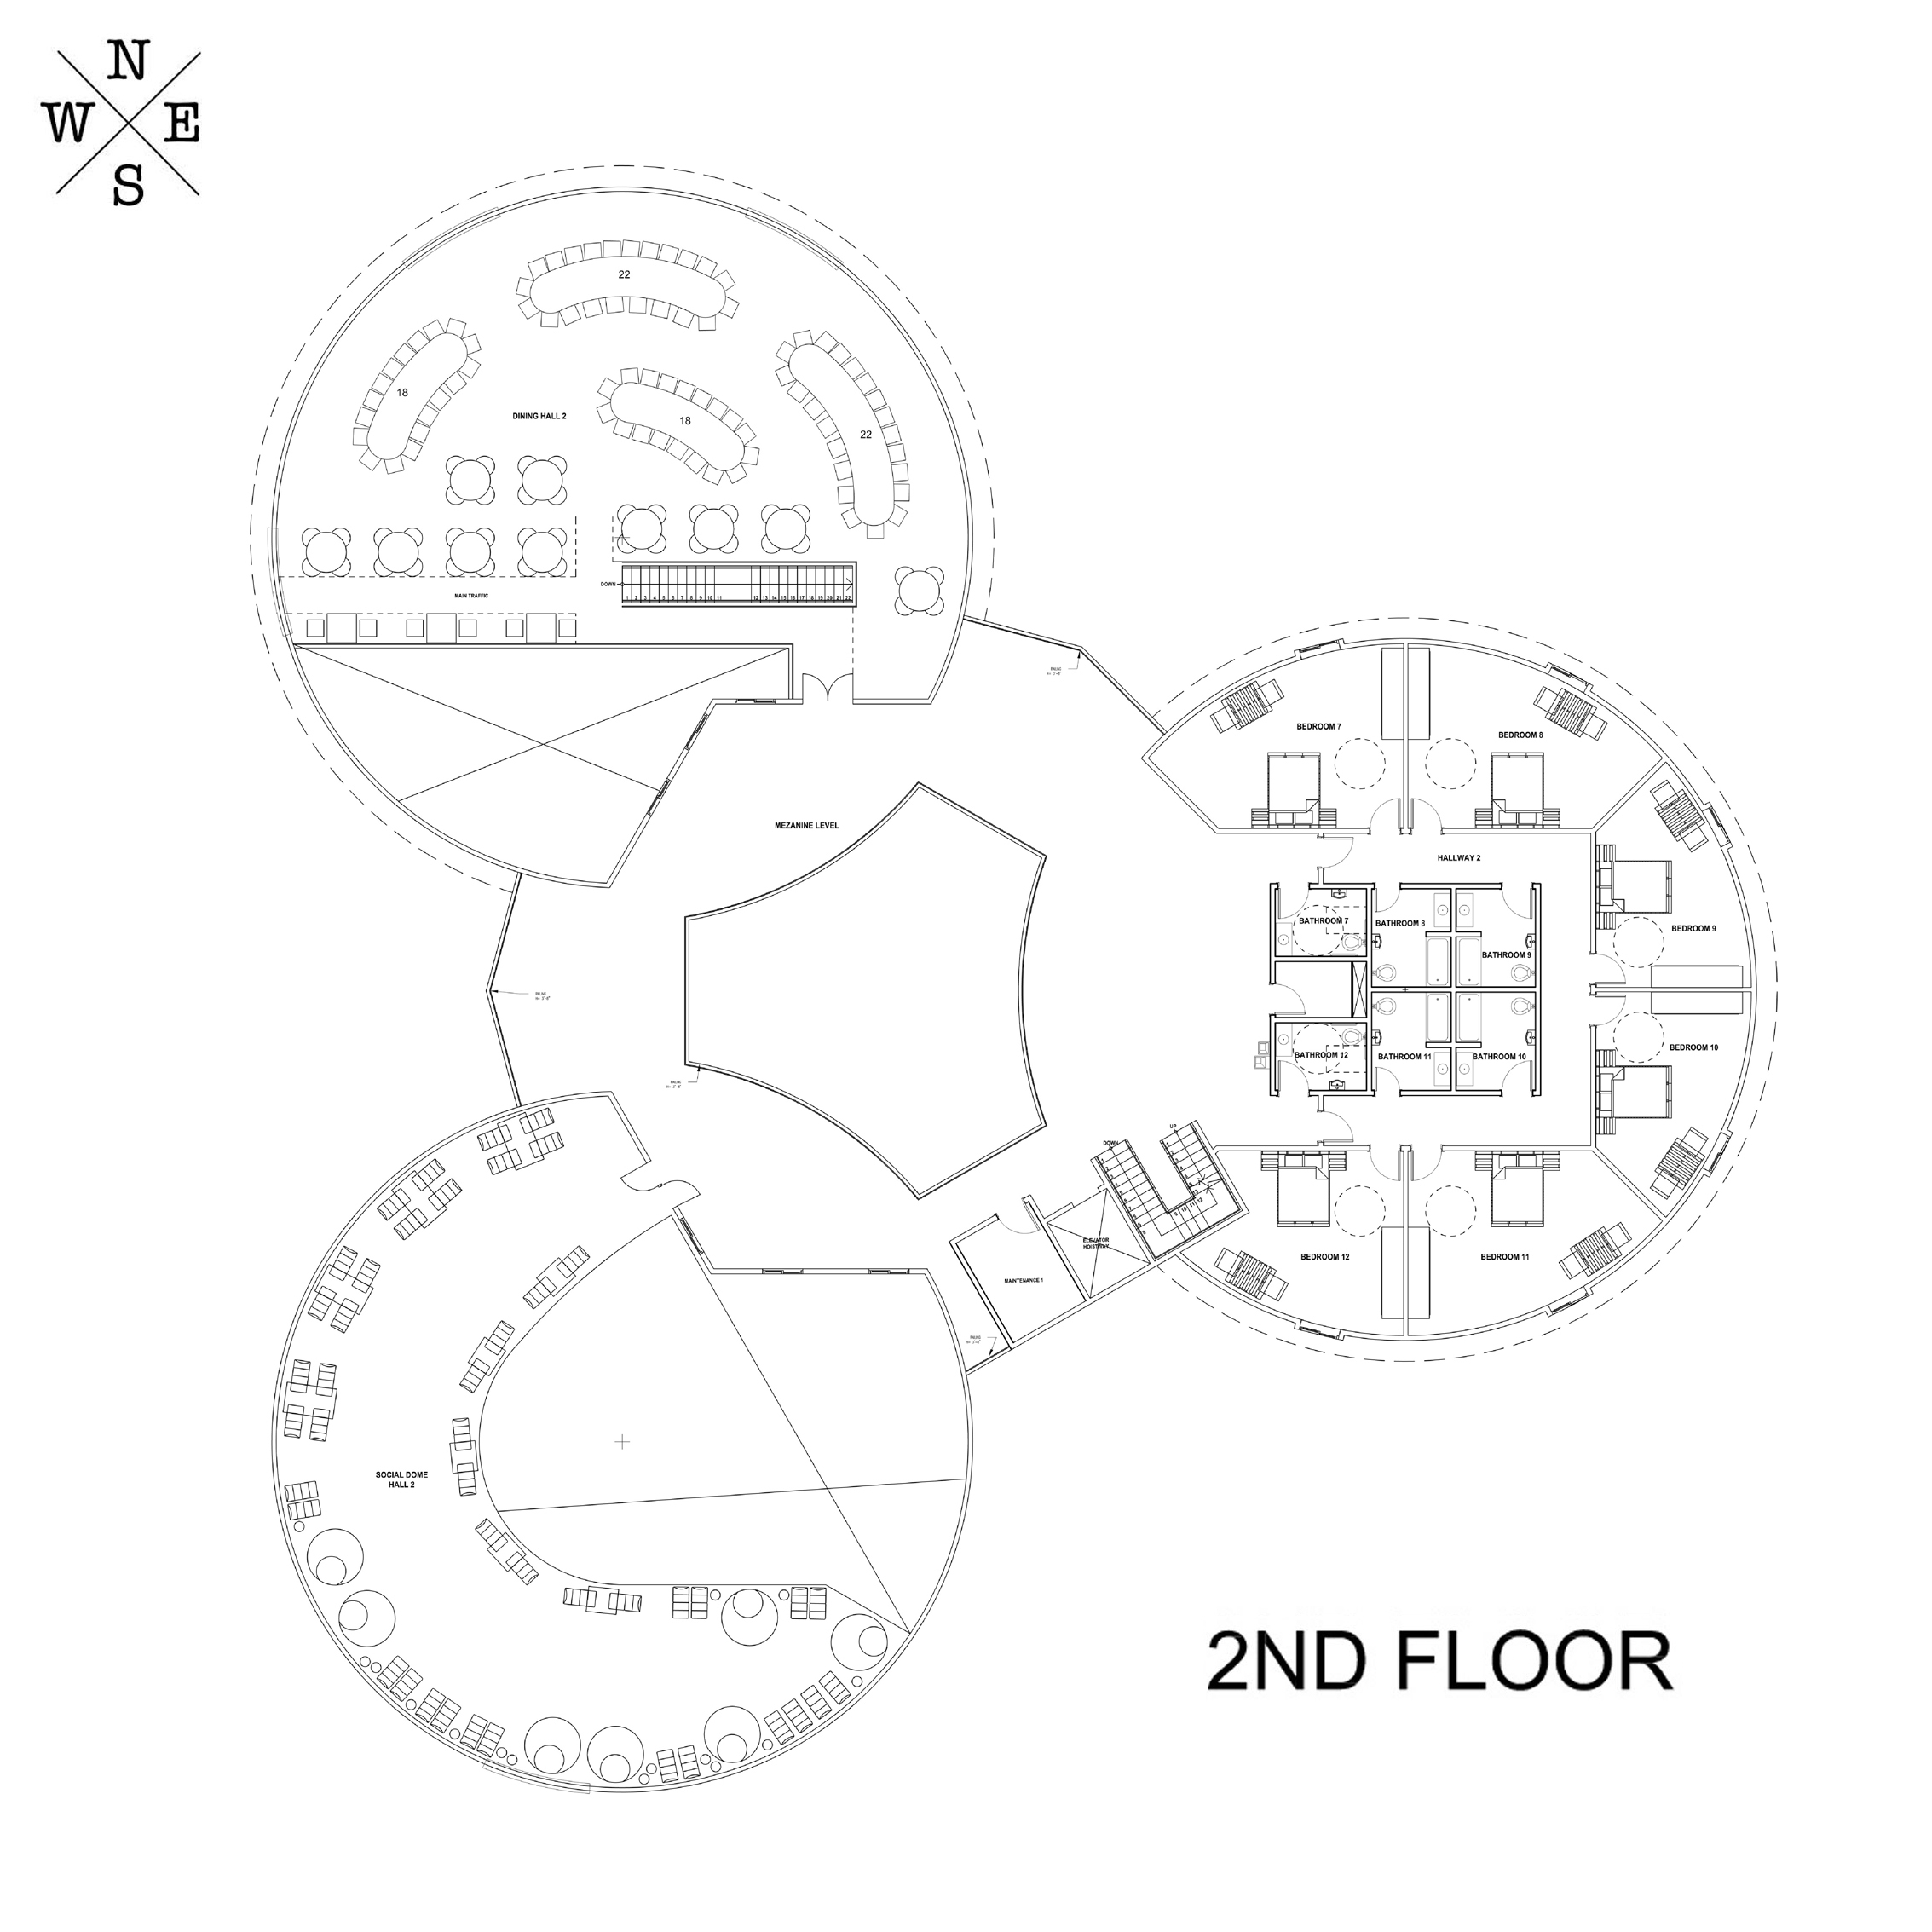 2267x2267 Collection Open Source Building Design Software Photos,